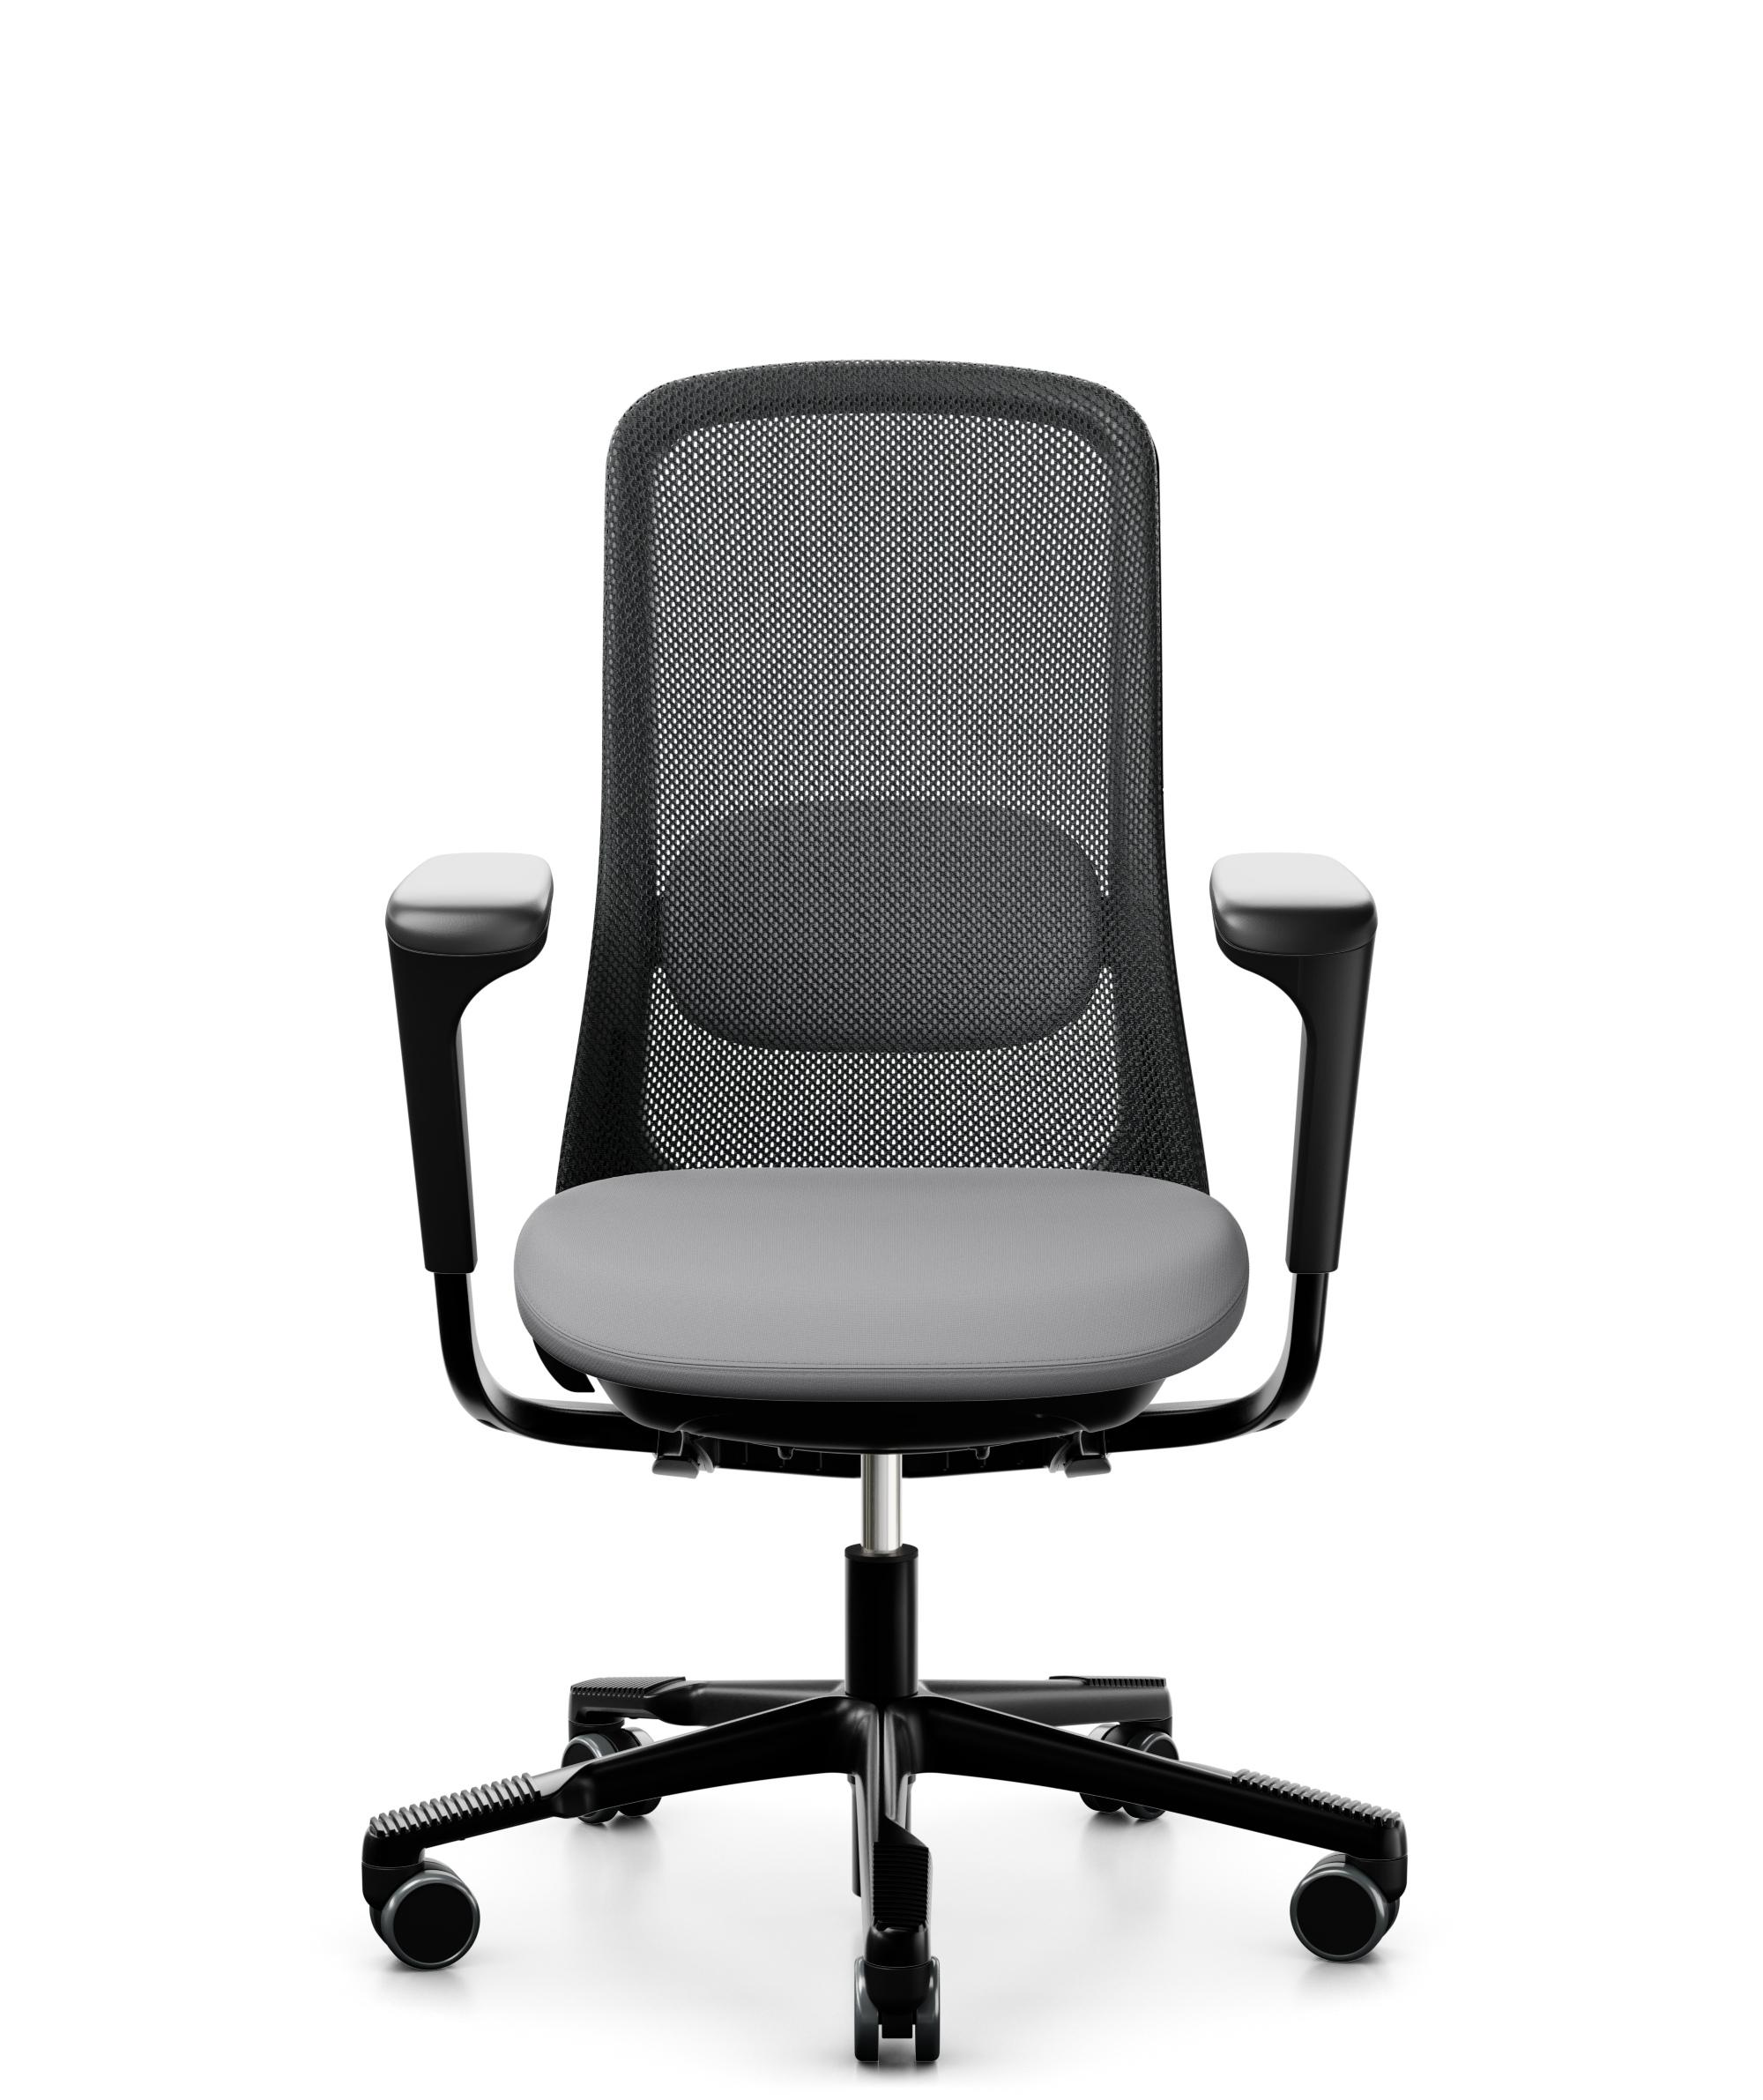 Flokk - HAG SoFi Mesh - Ergonomic Office Chair